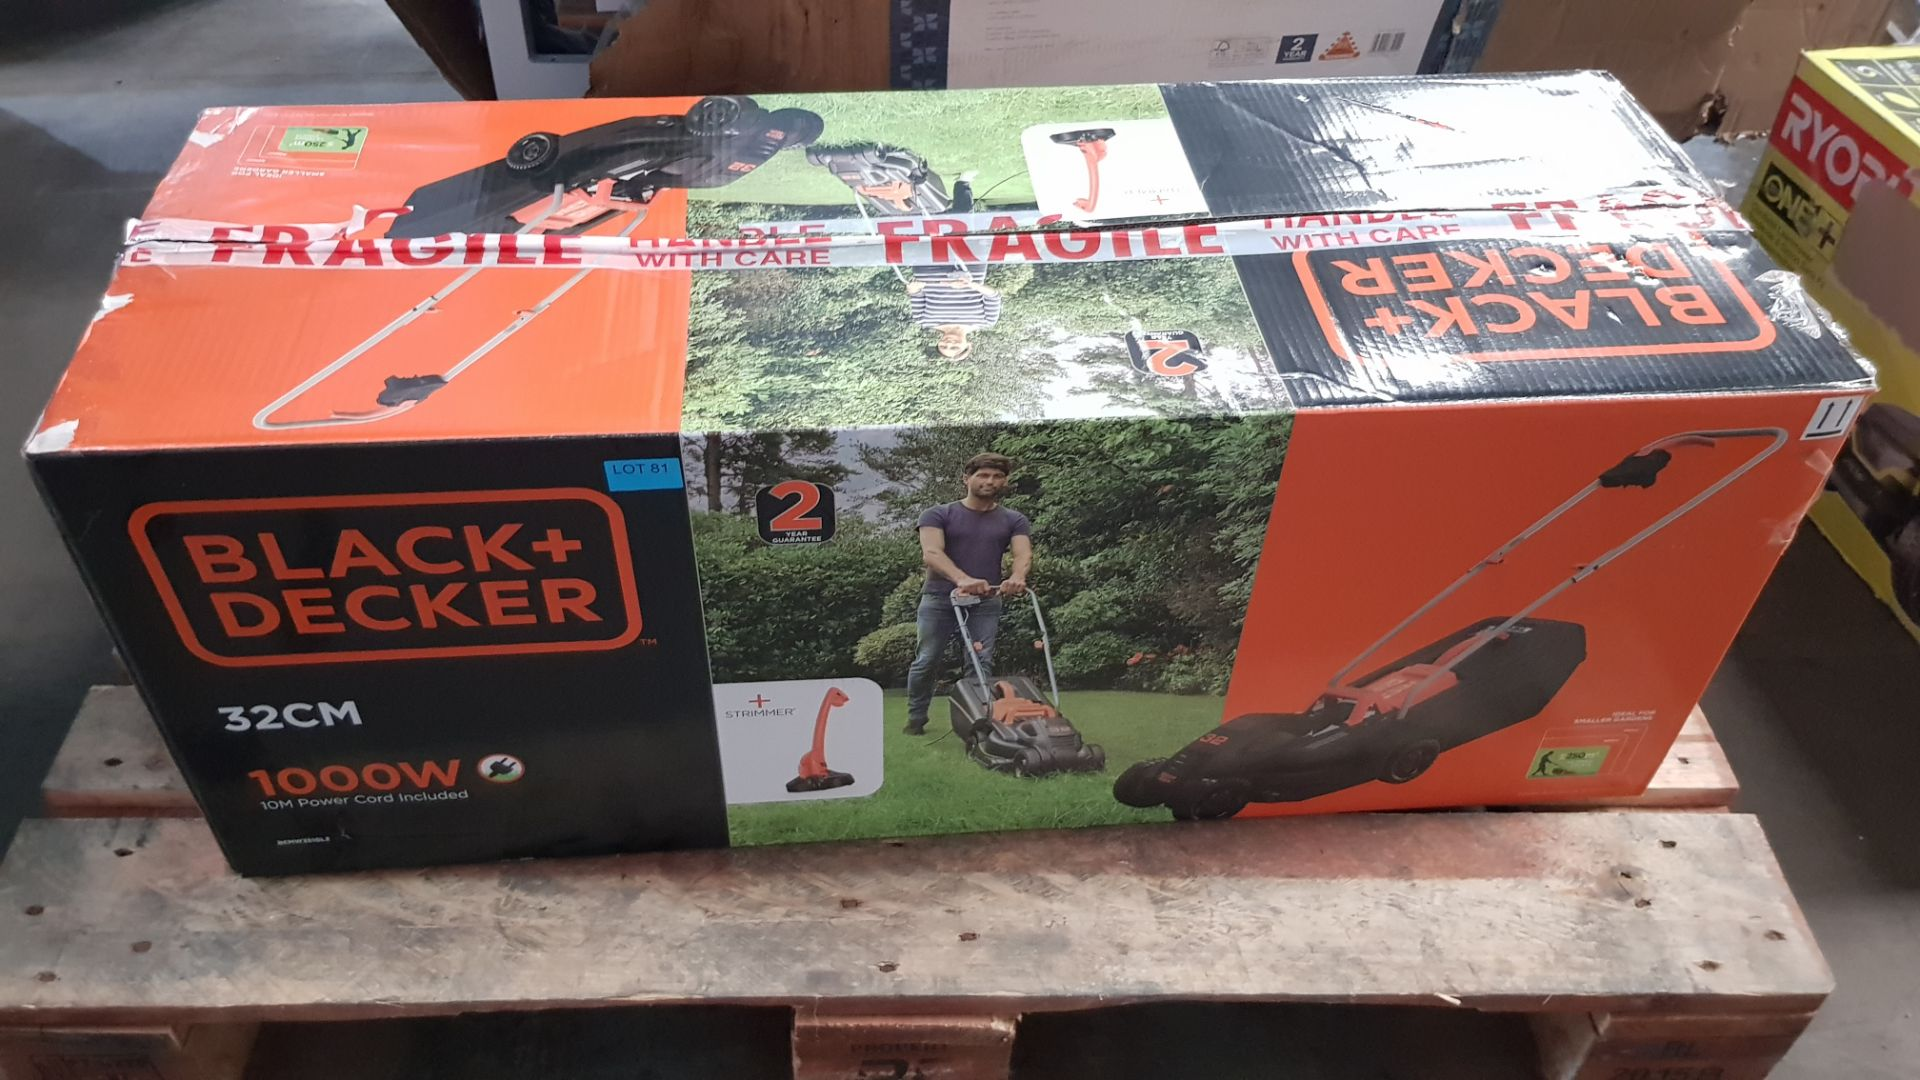 (P5) 1x Black & Decker 32cm 1000W Corded Lawn Mower & Strimmer RRP £99. Contents Appear Clean, Unus - Image 4 of 5